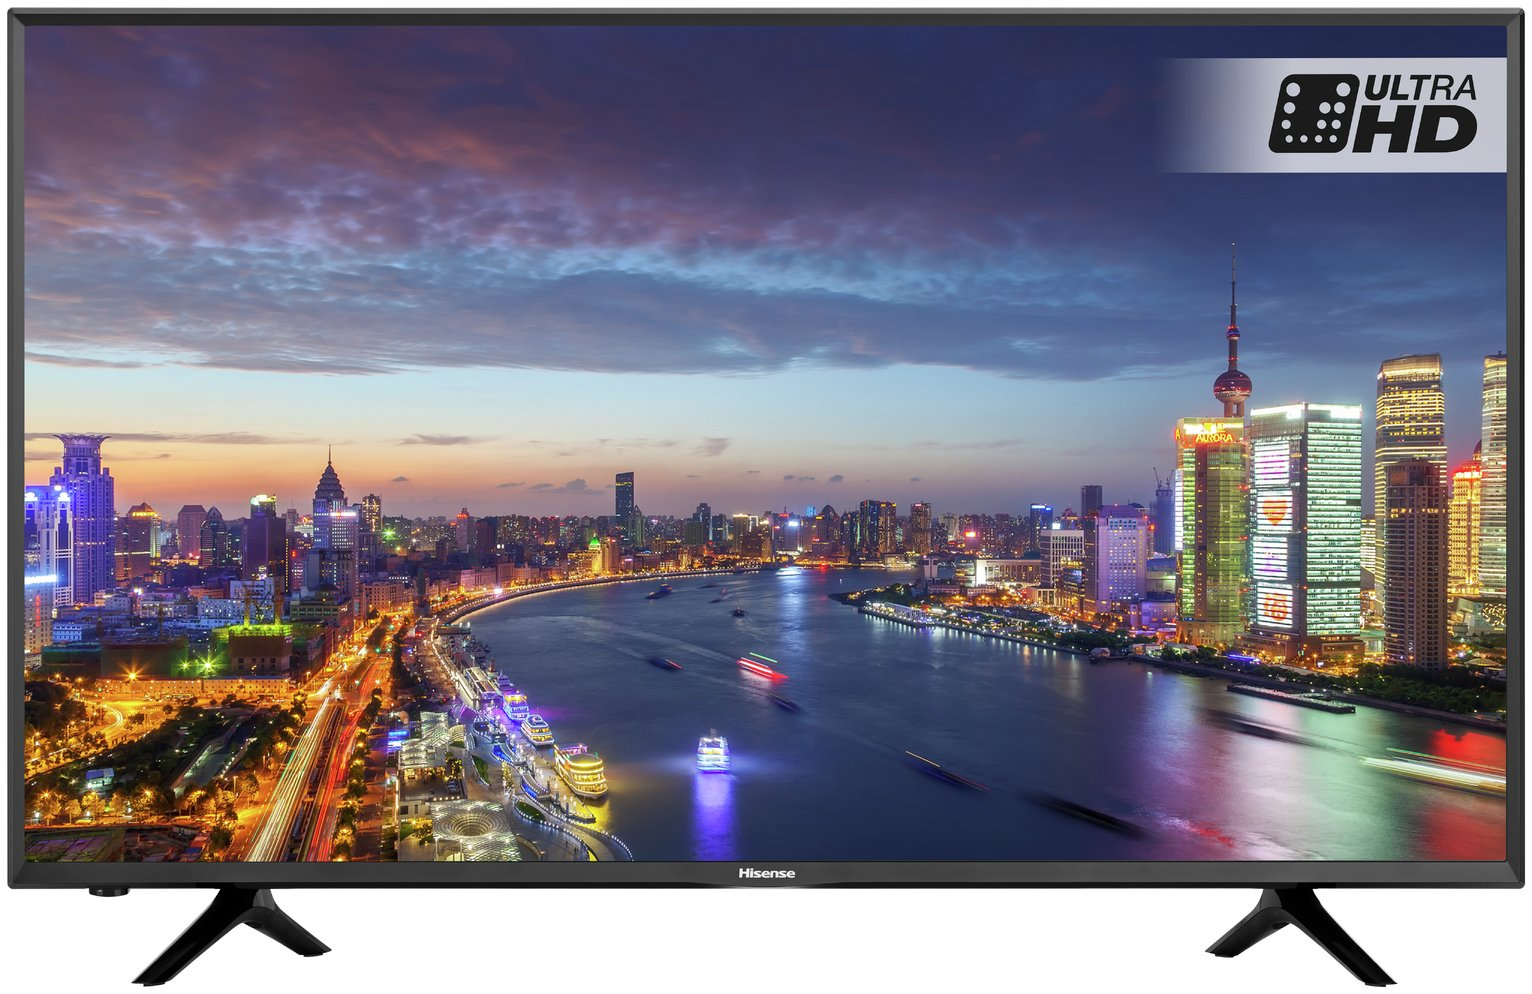 Hisense H65N5300 65 Inch 4K Ultra HD Smart TV.